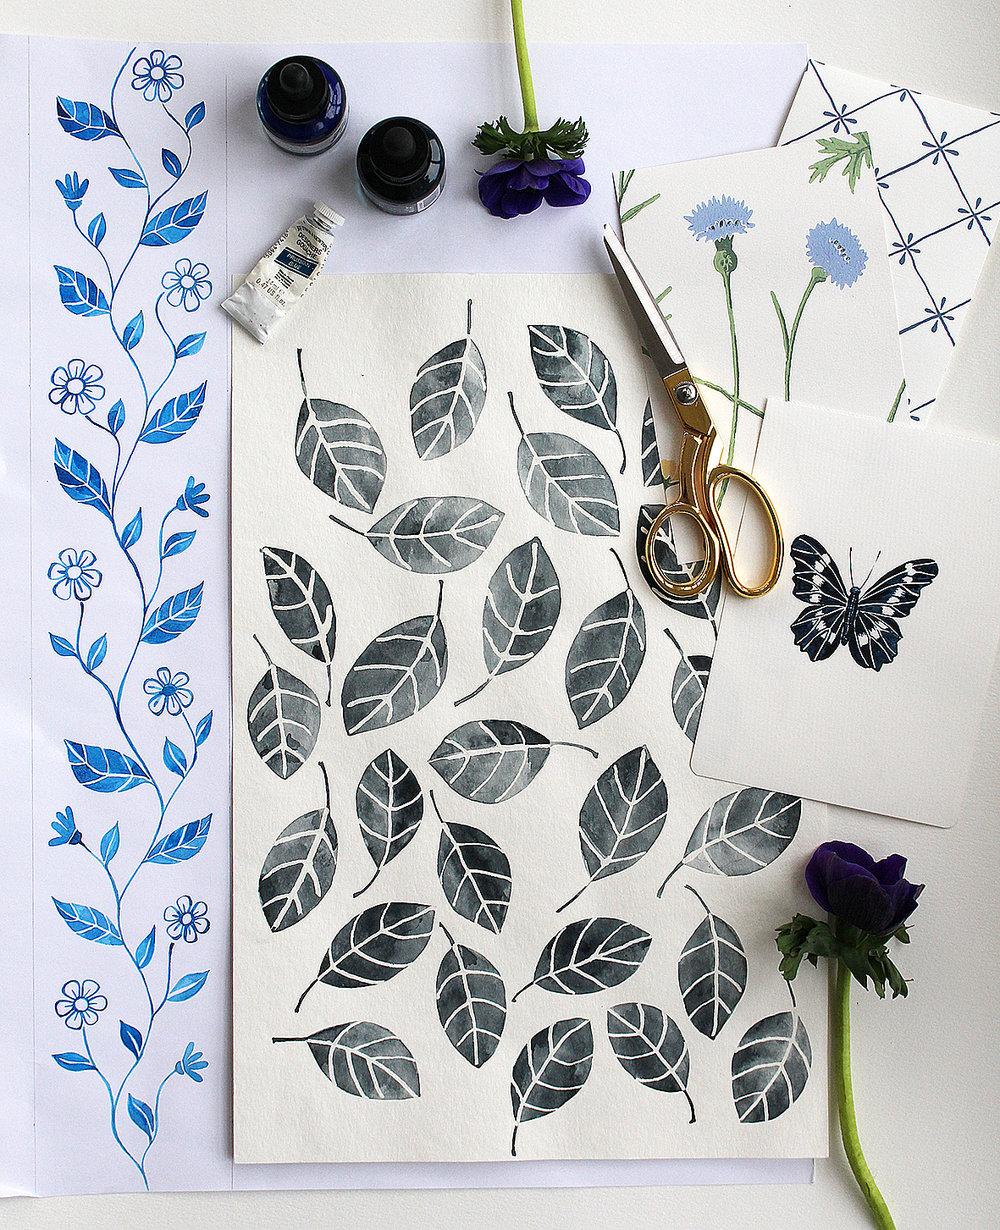 Hanna_Wendelbo_blogg_blue_wallpapers